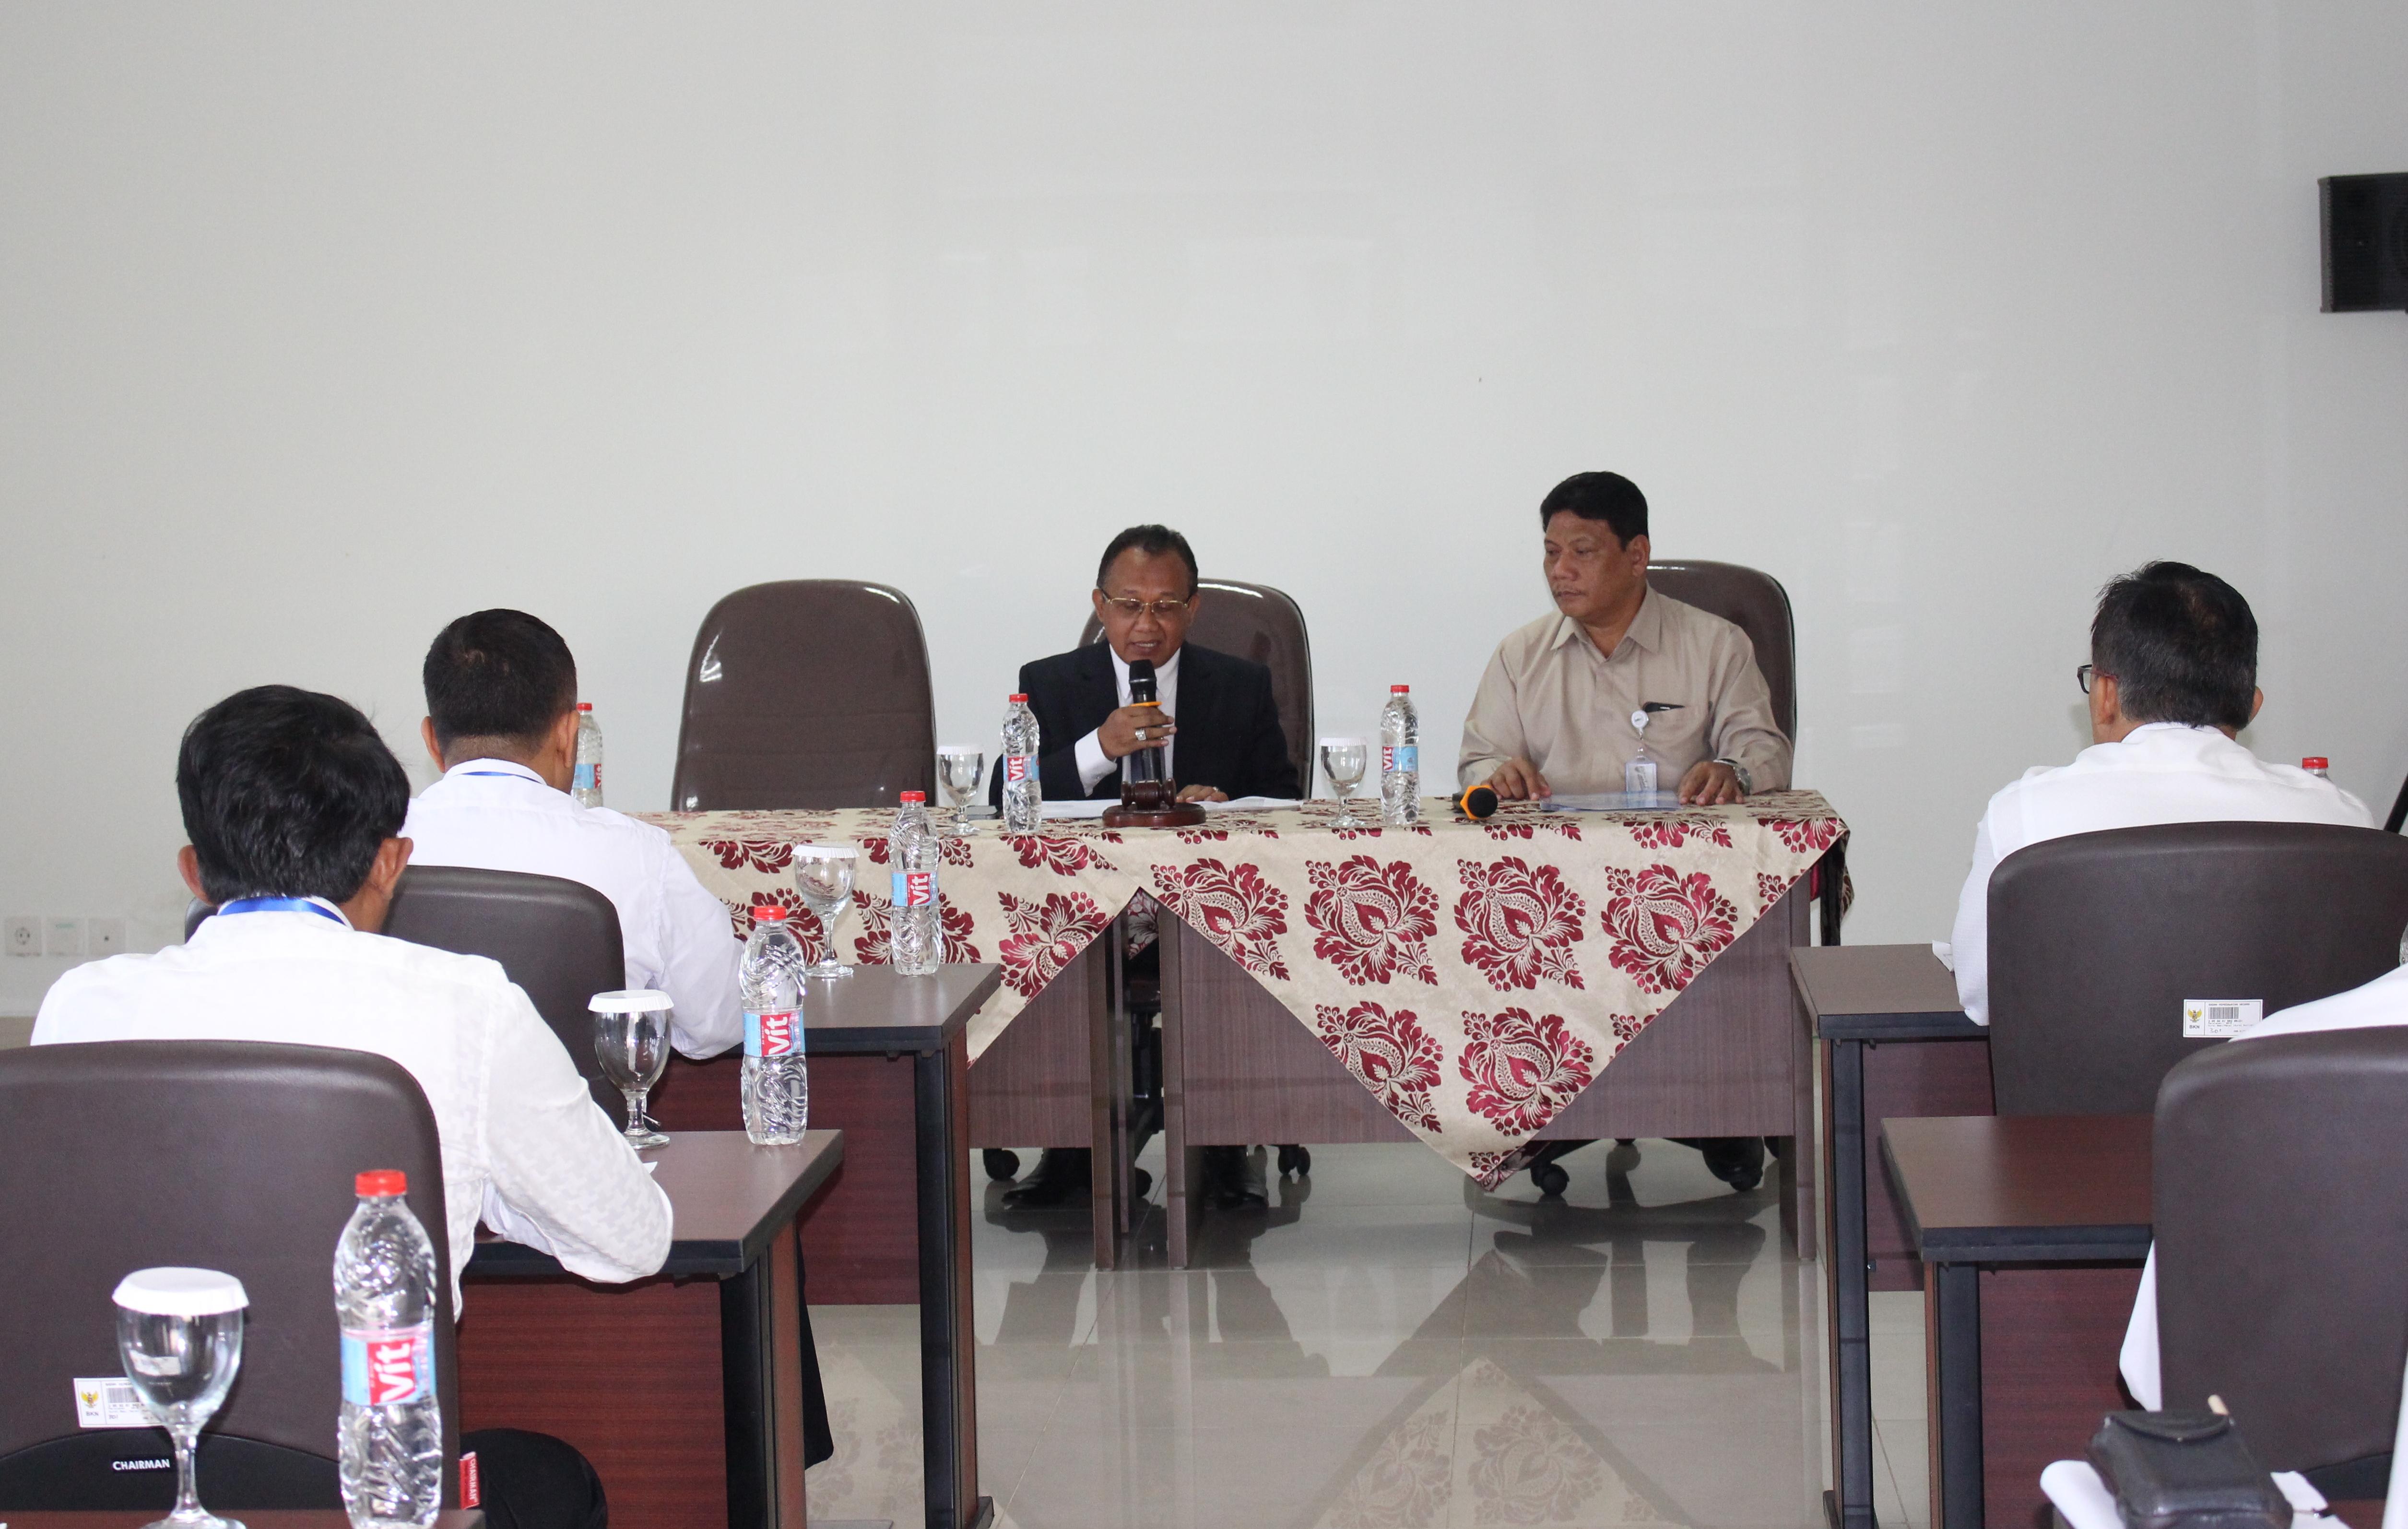 Sekretaris MA Membuka Test Assessment Bagi Peserta Lelang Jabatan Pmpinan Tinggi Madya dan Pratama Pada Mahkamah Agung RI